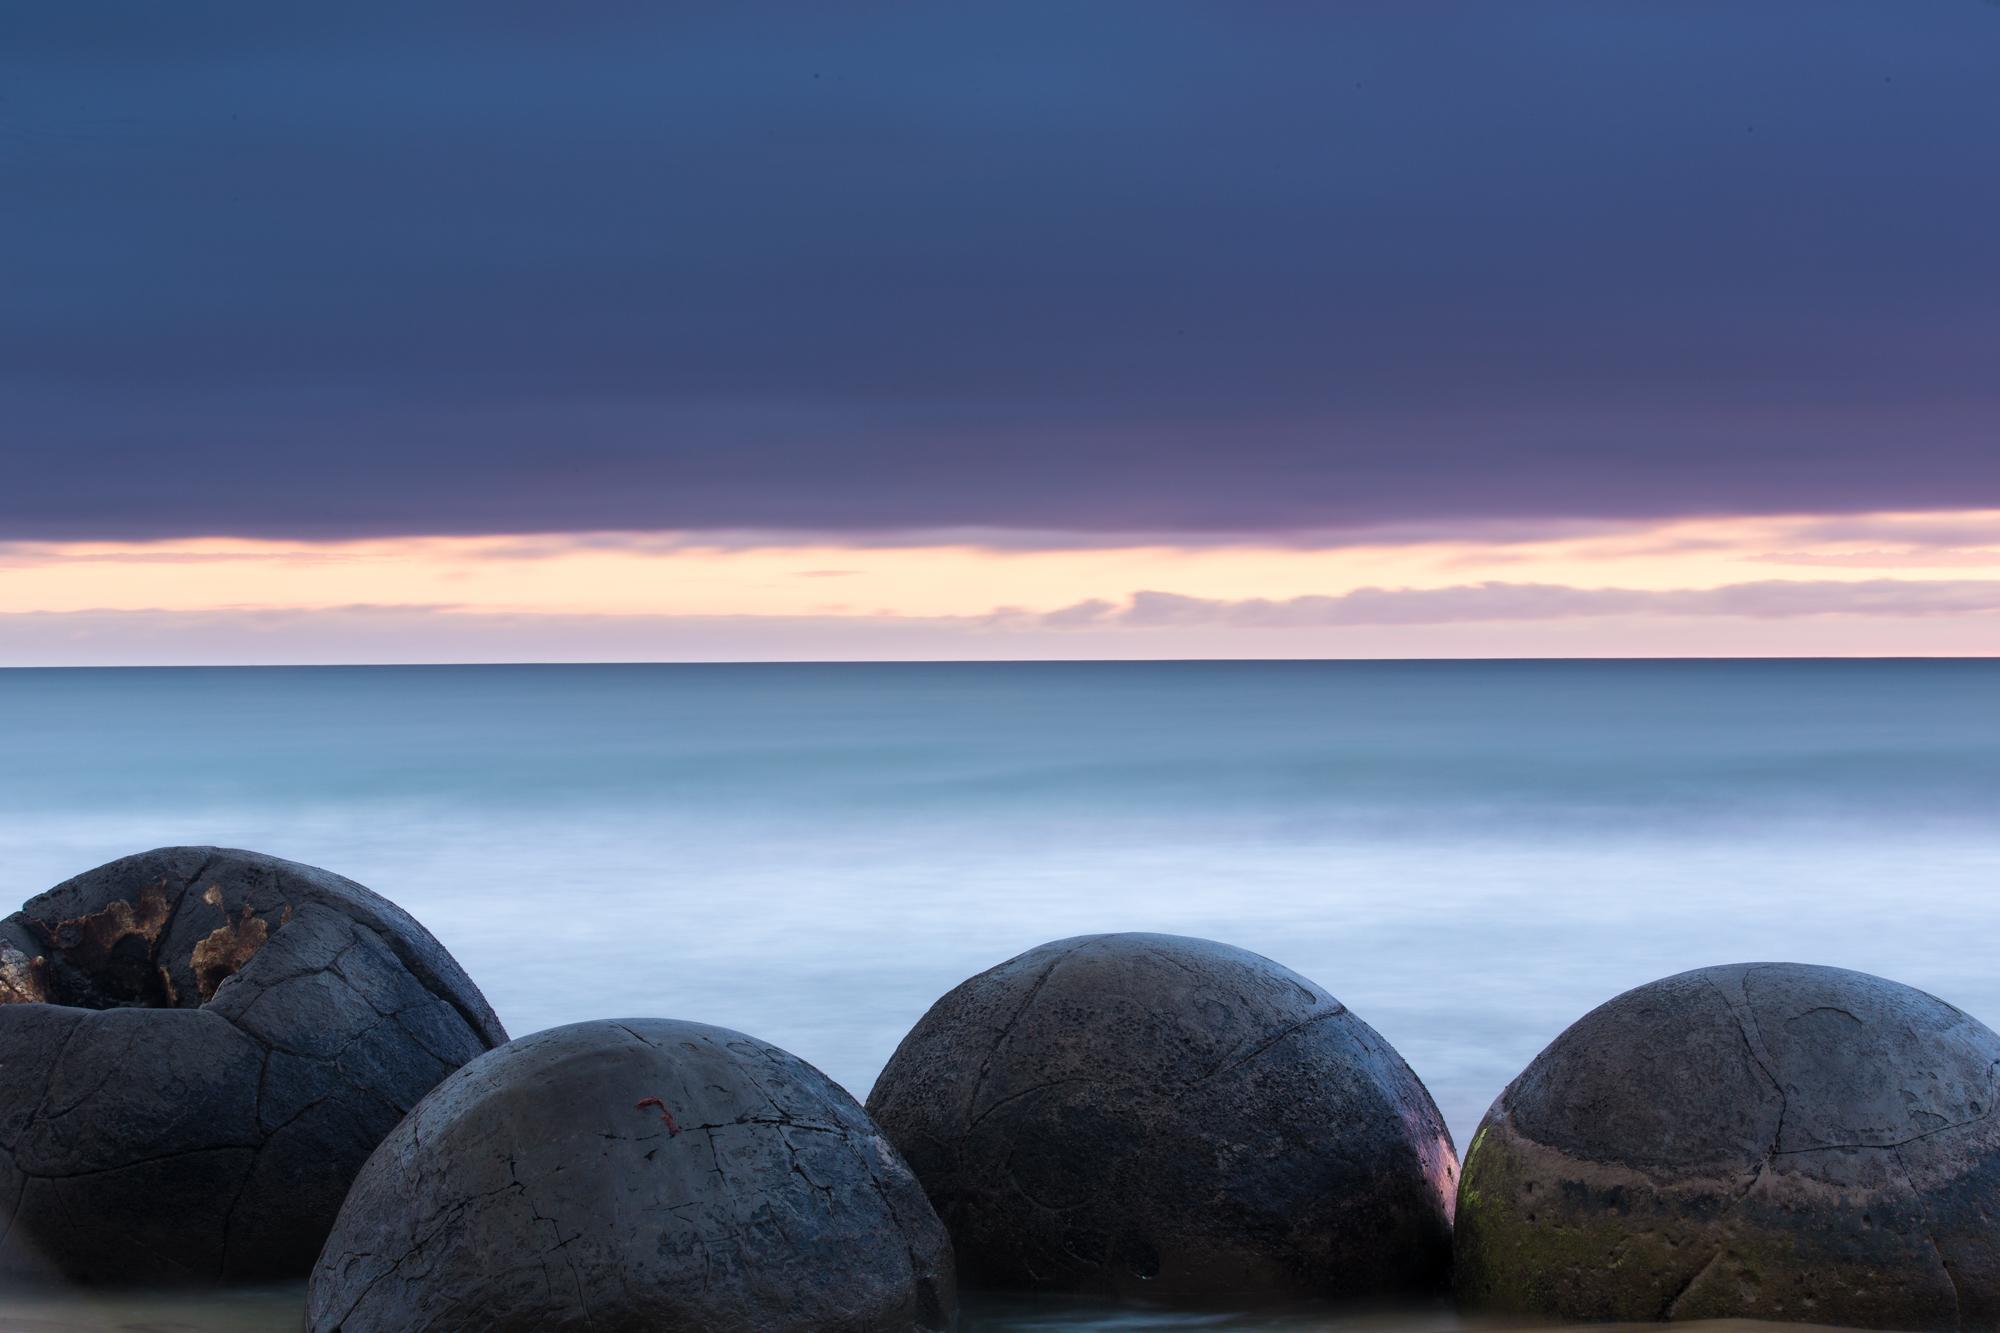 Rocks on the edge of the ocean